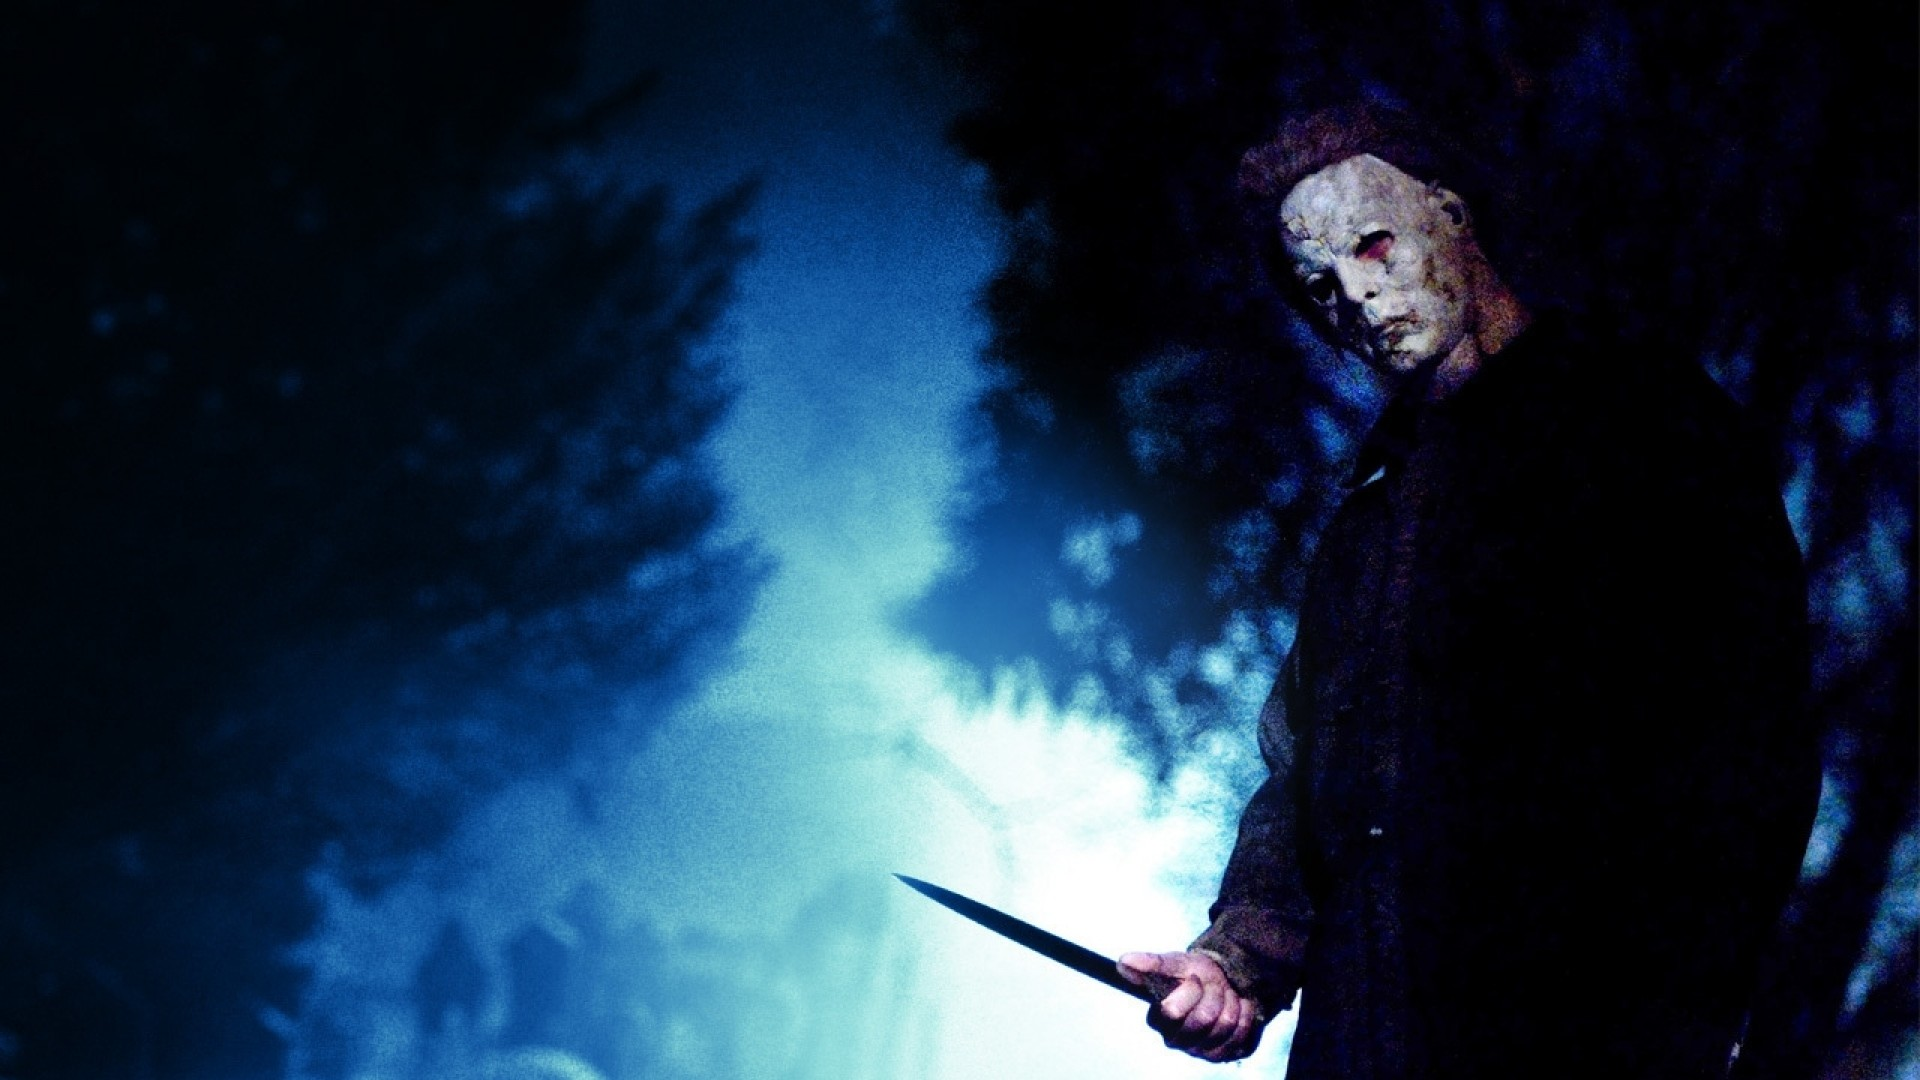 Wallpaper michael myers, maniac, killer, knife, mask, fear, horror